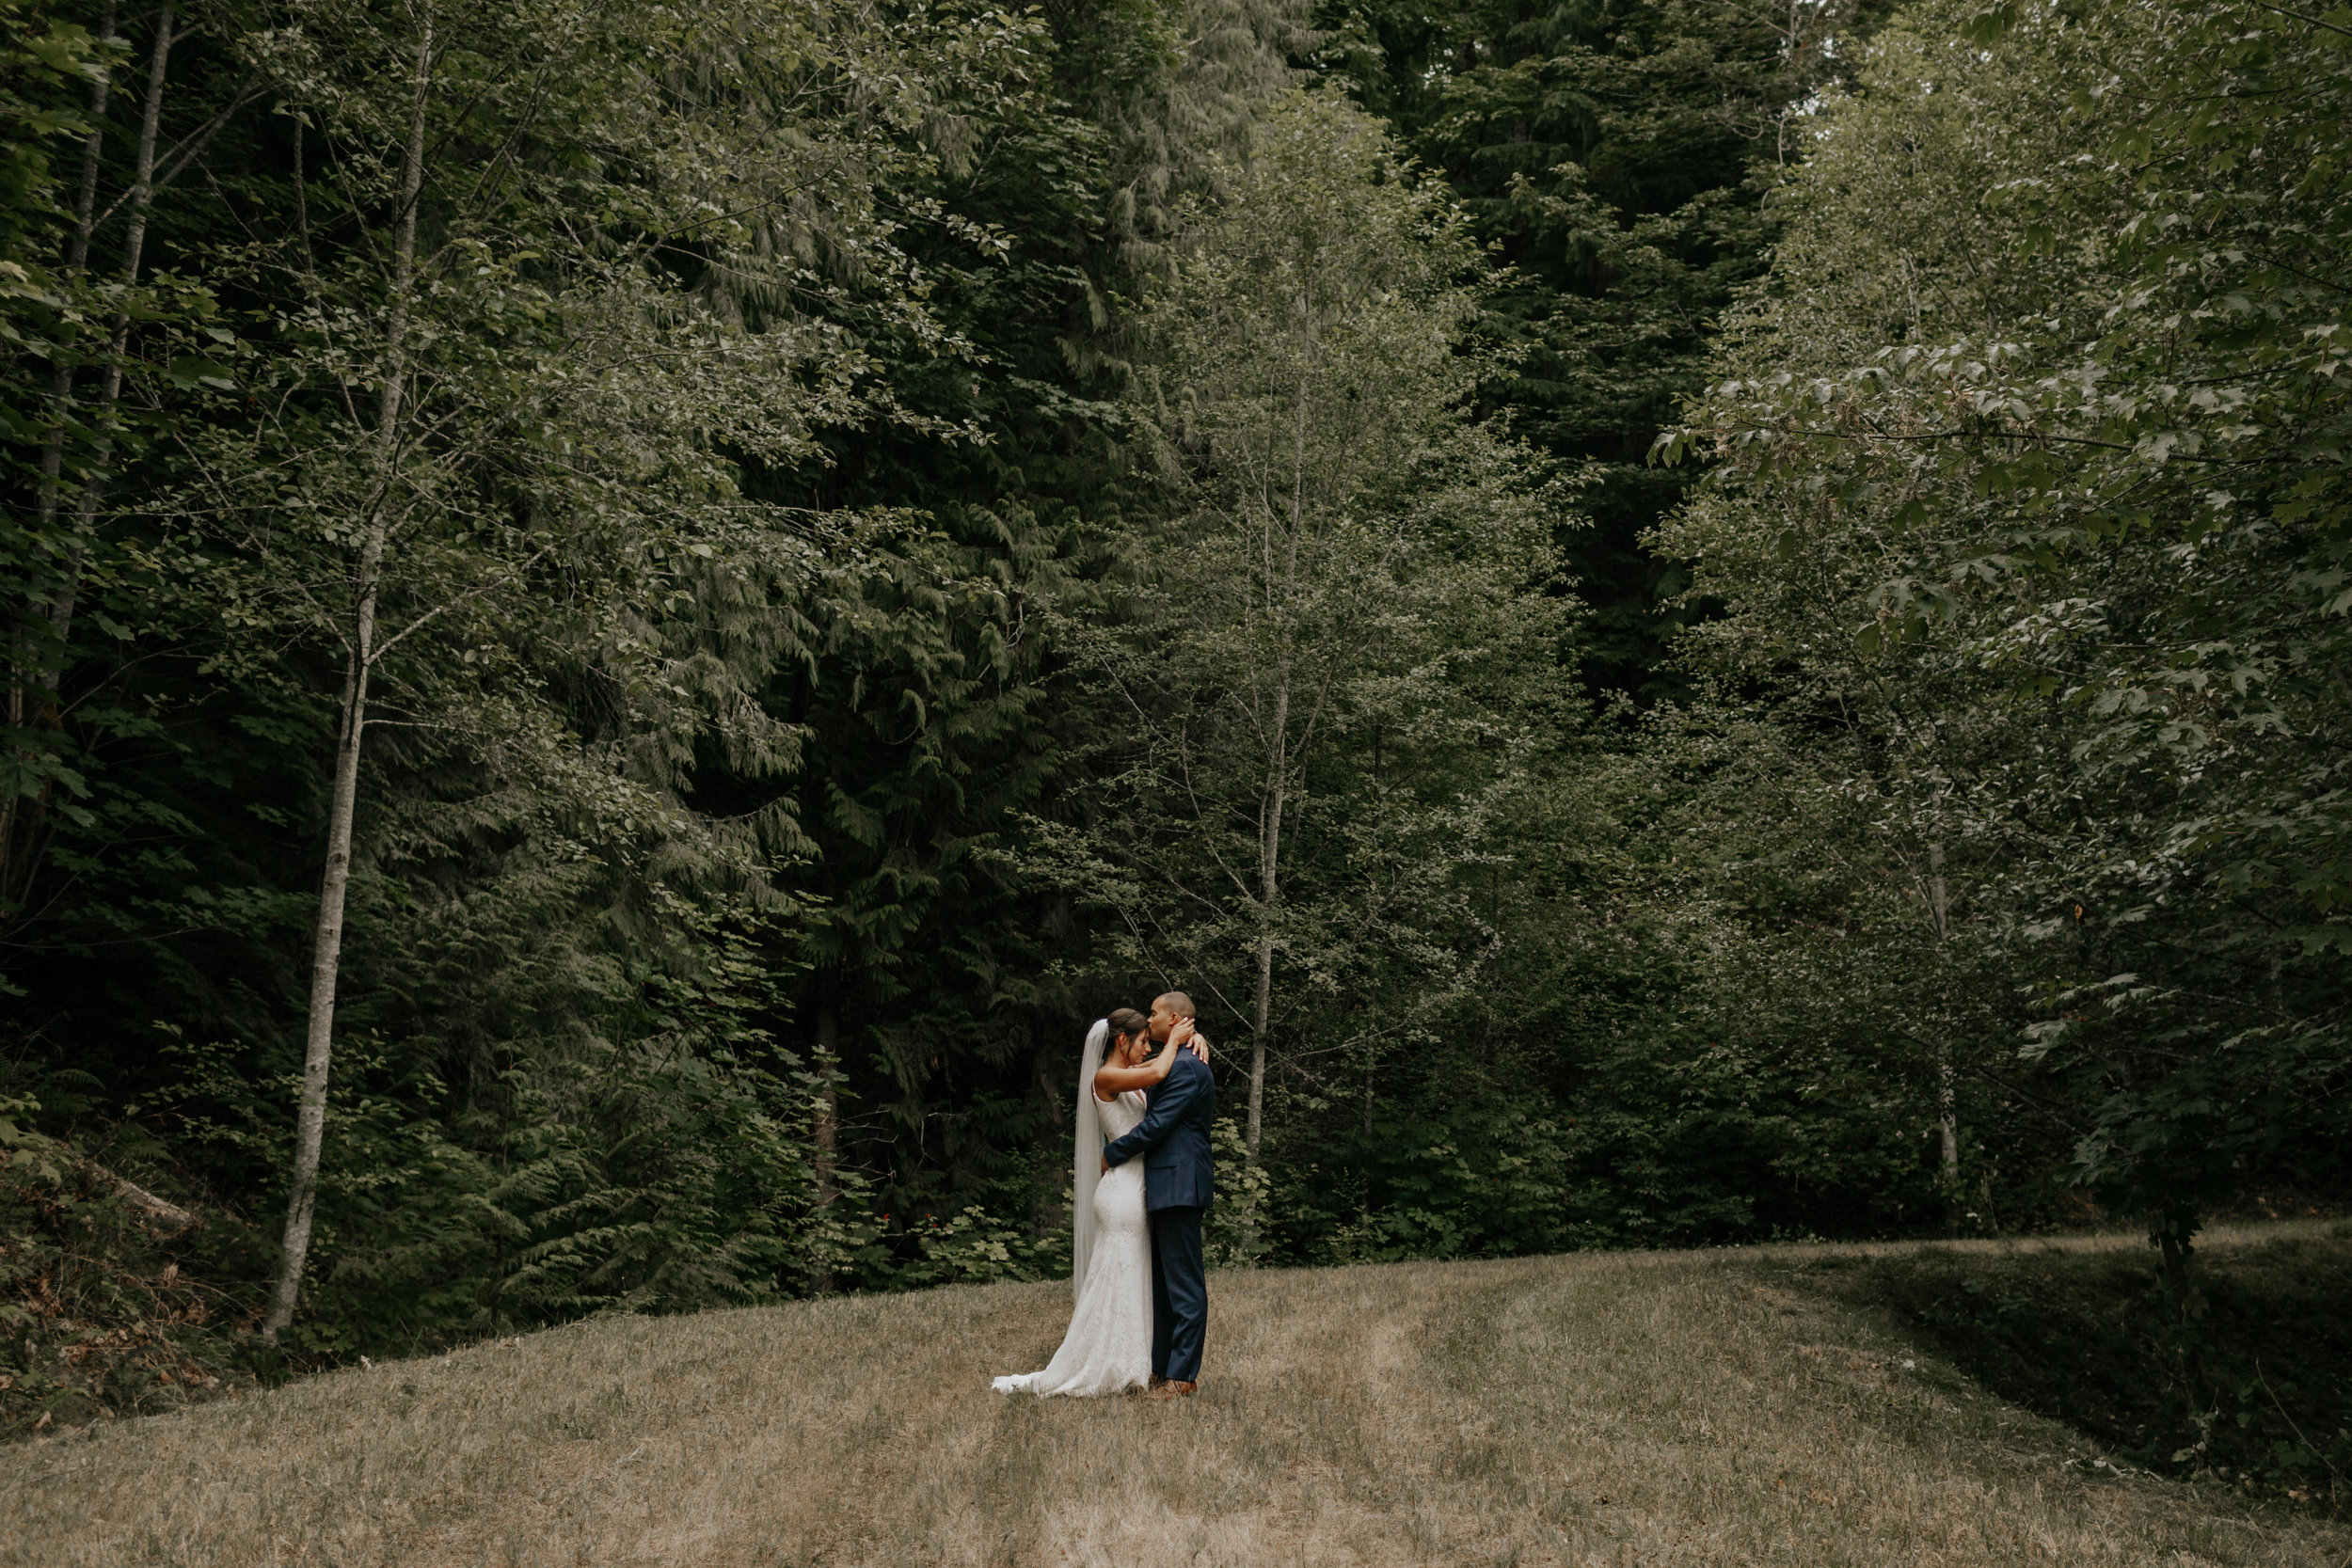 ginapaulson_aubreejeff_wedding-174.jpg